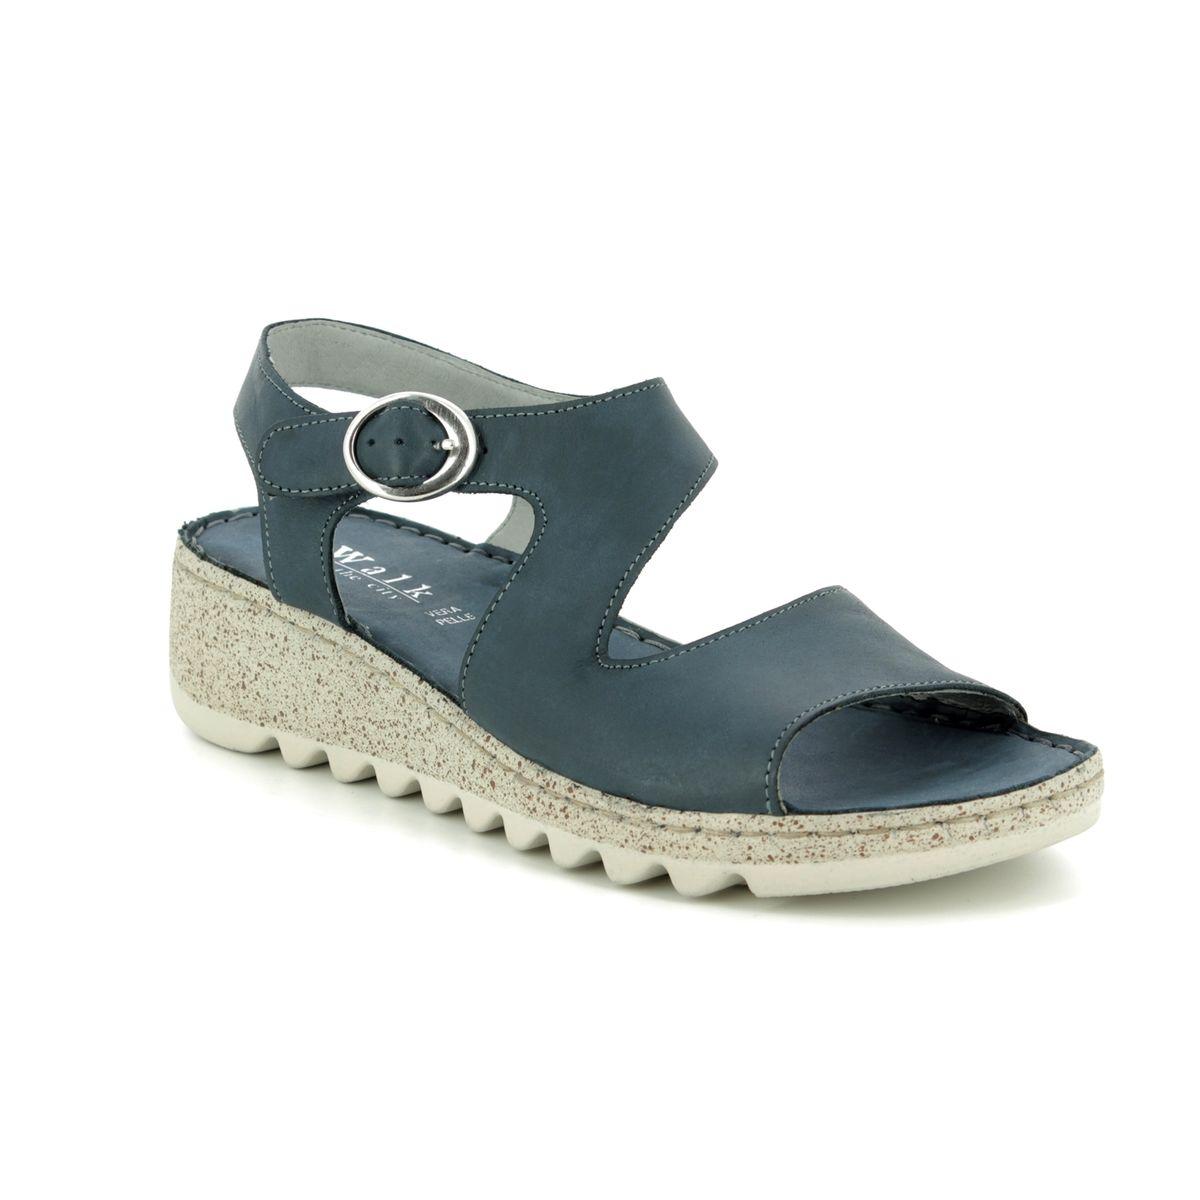 c49fb017c Walk in the City Wedge Sandals - Denim leather - 9371 36170 TRAMBA